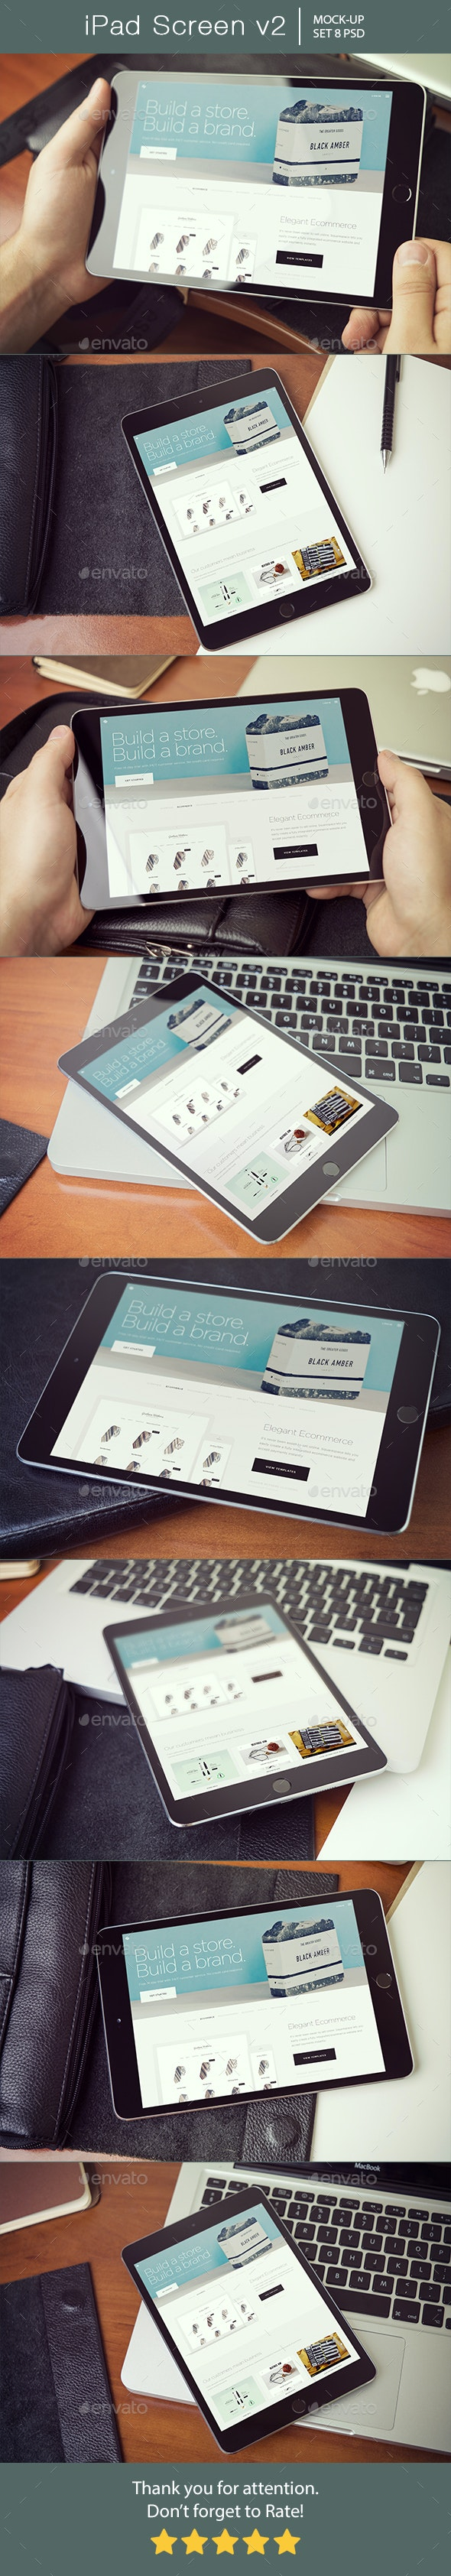 iPad Screen Mockup v2 - Mobile Displays